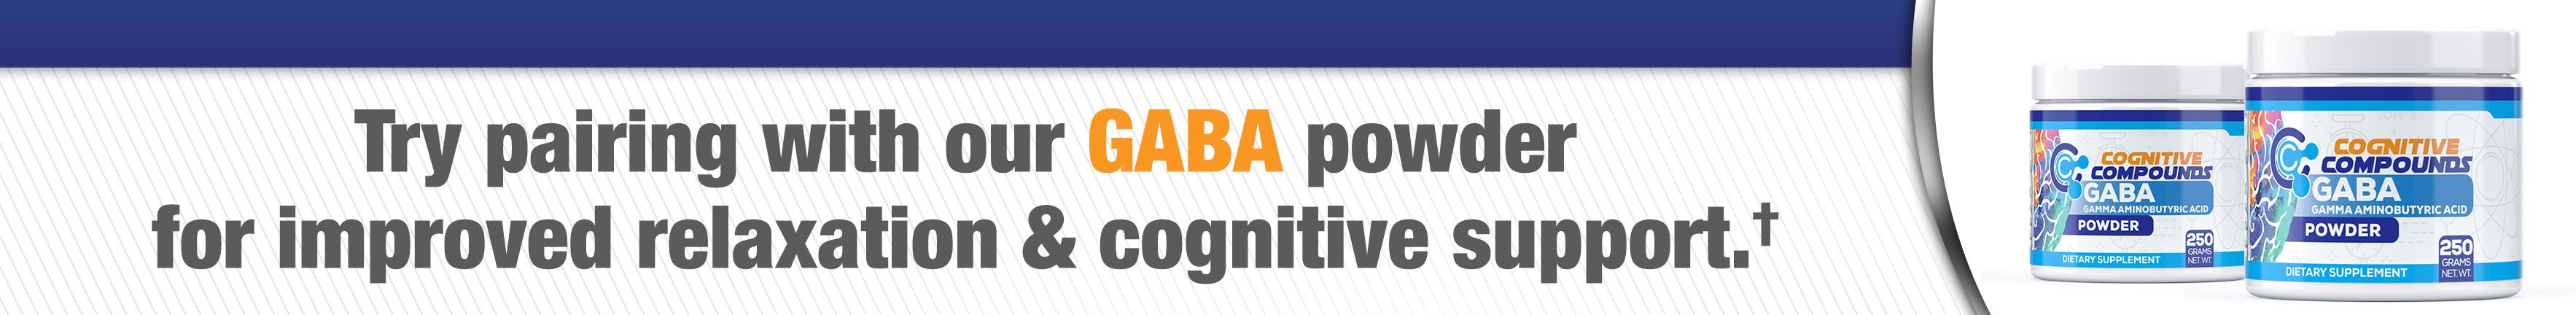 gaba-consider-10-21.jpg